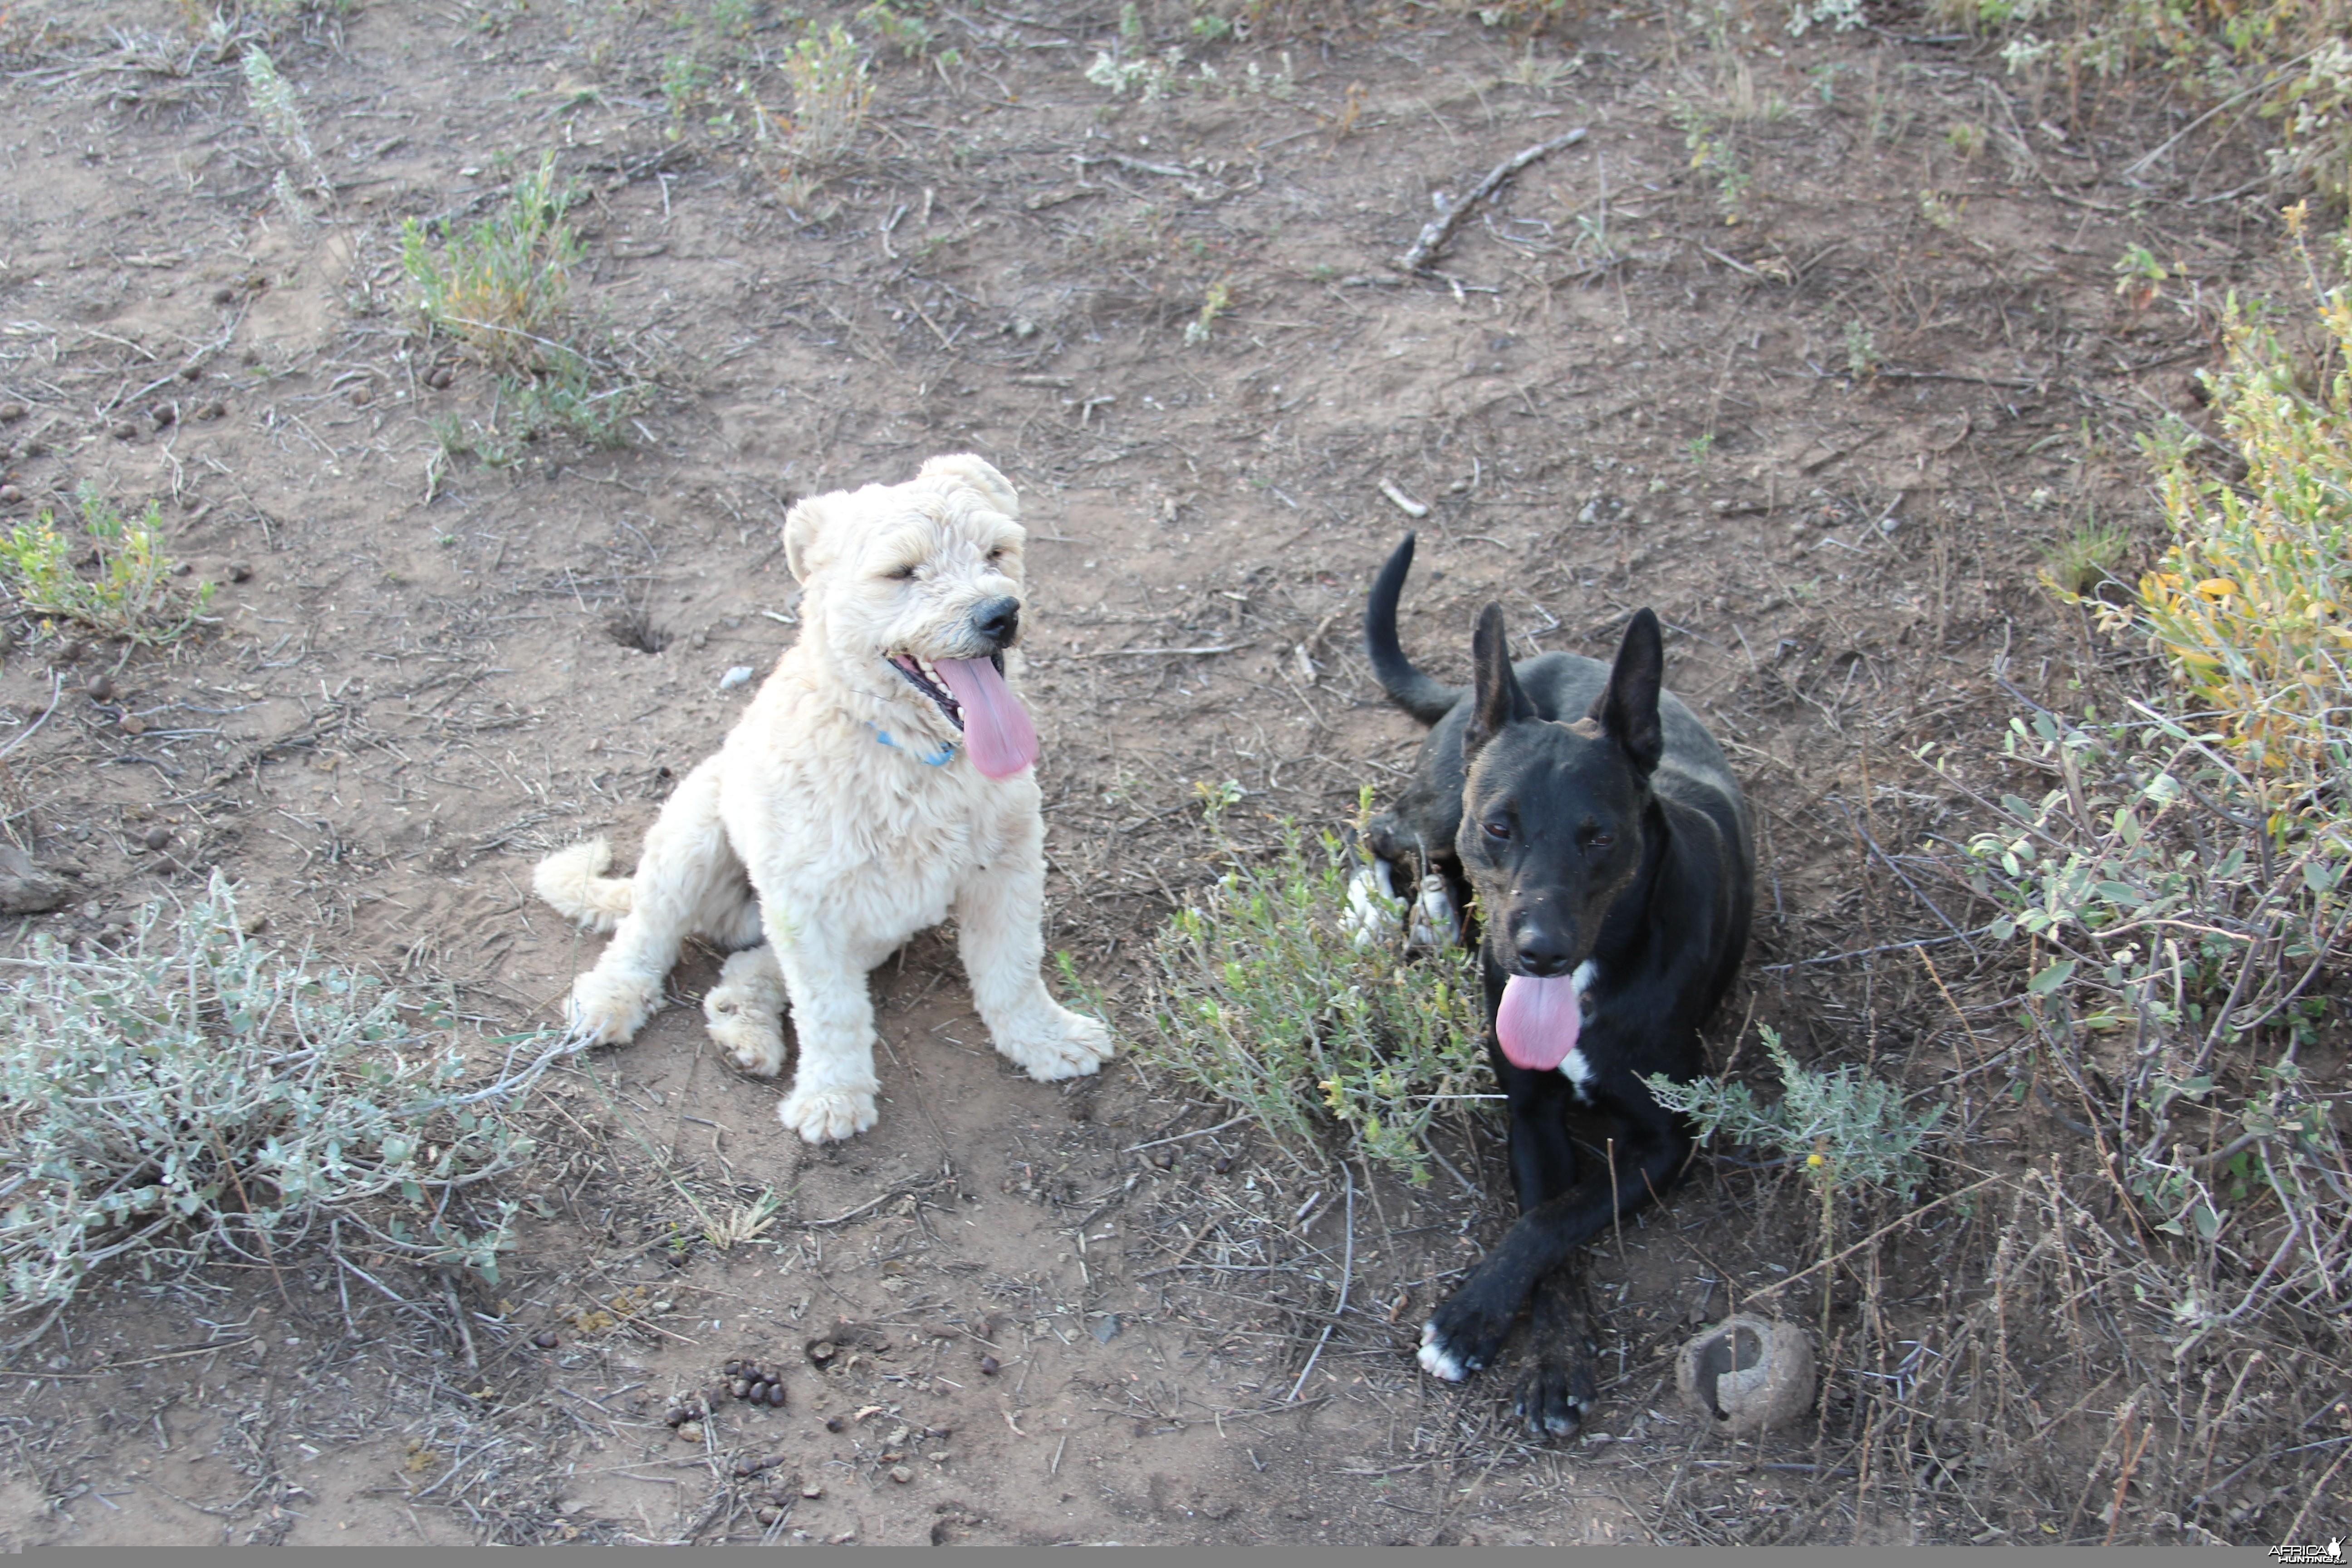 Namibian teammates